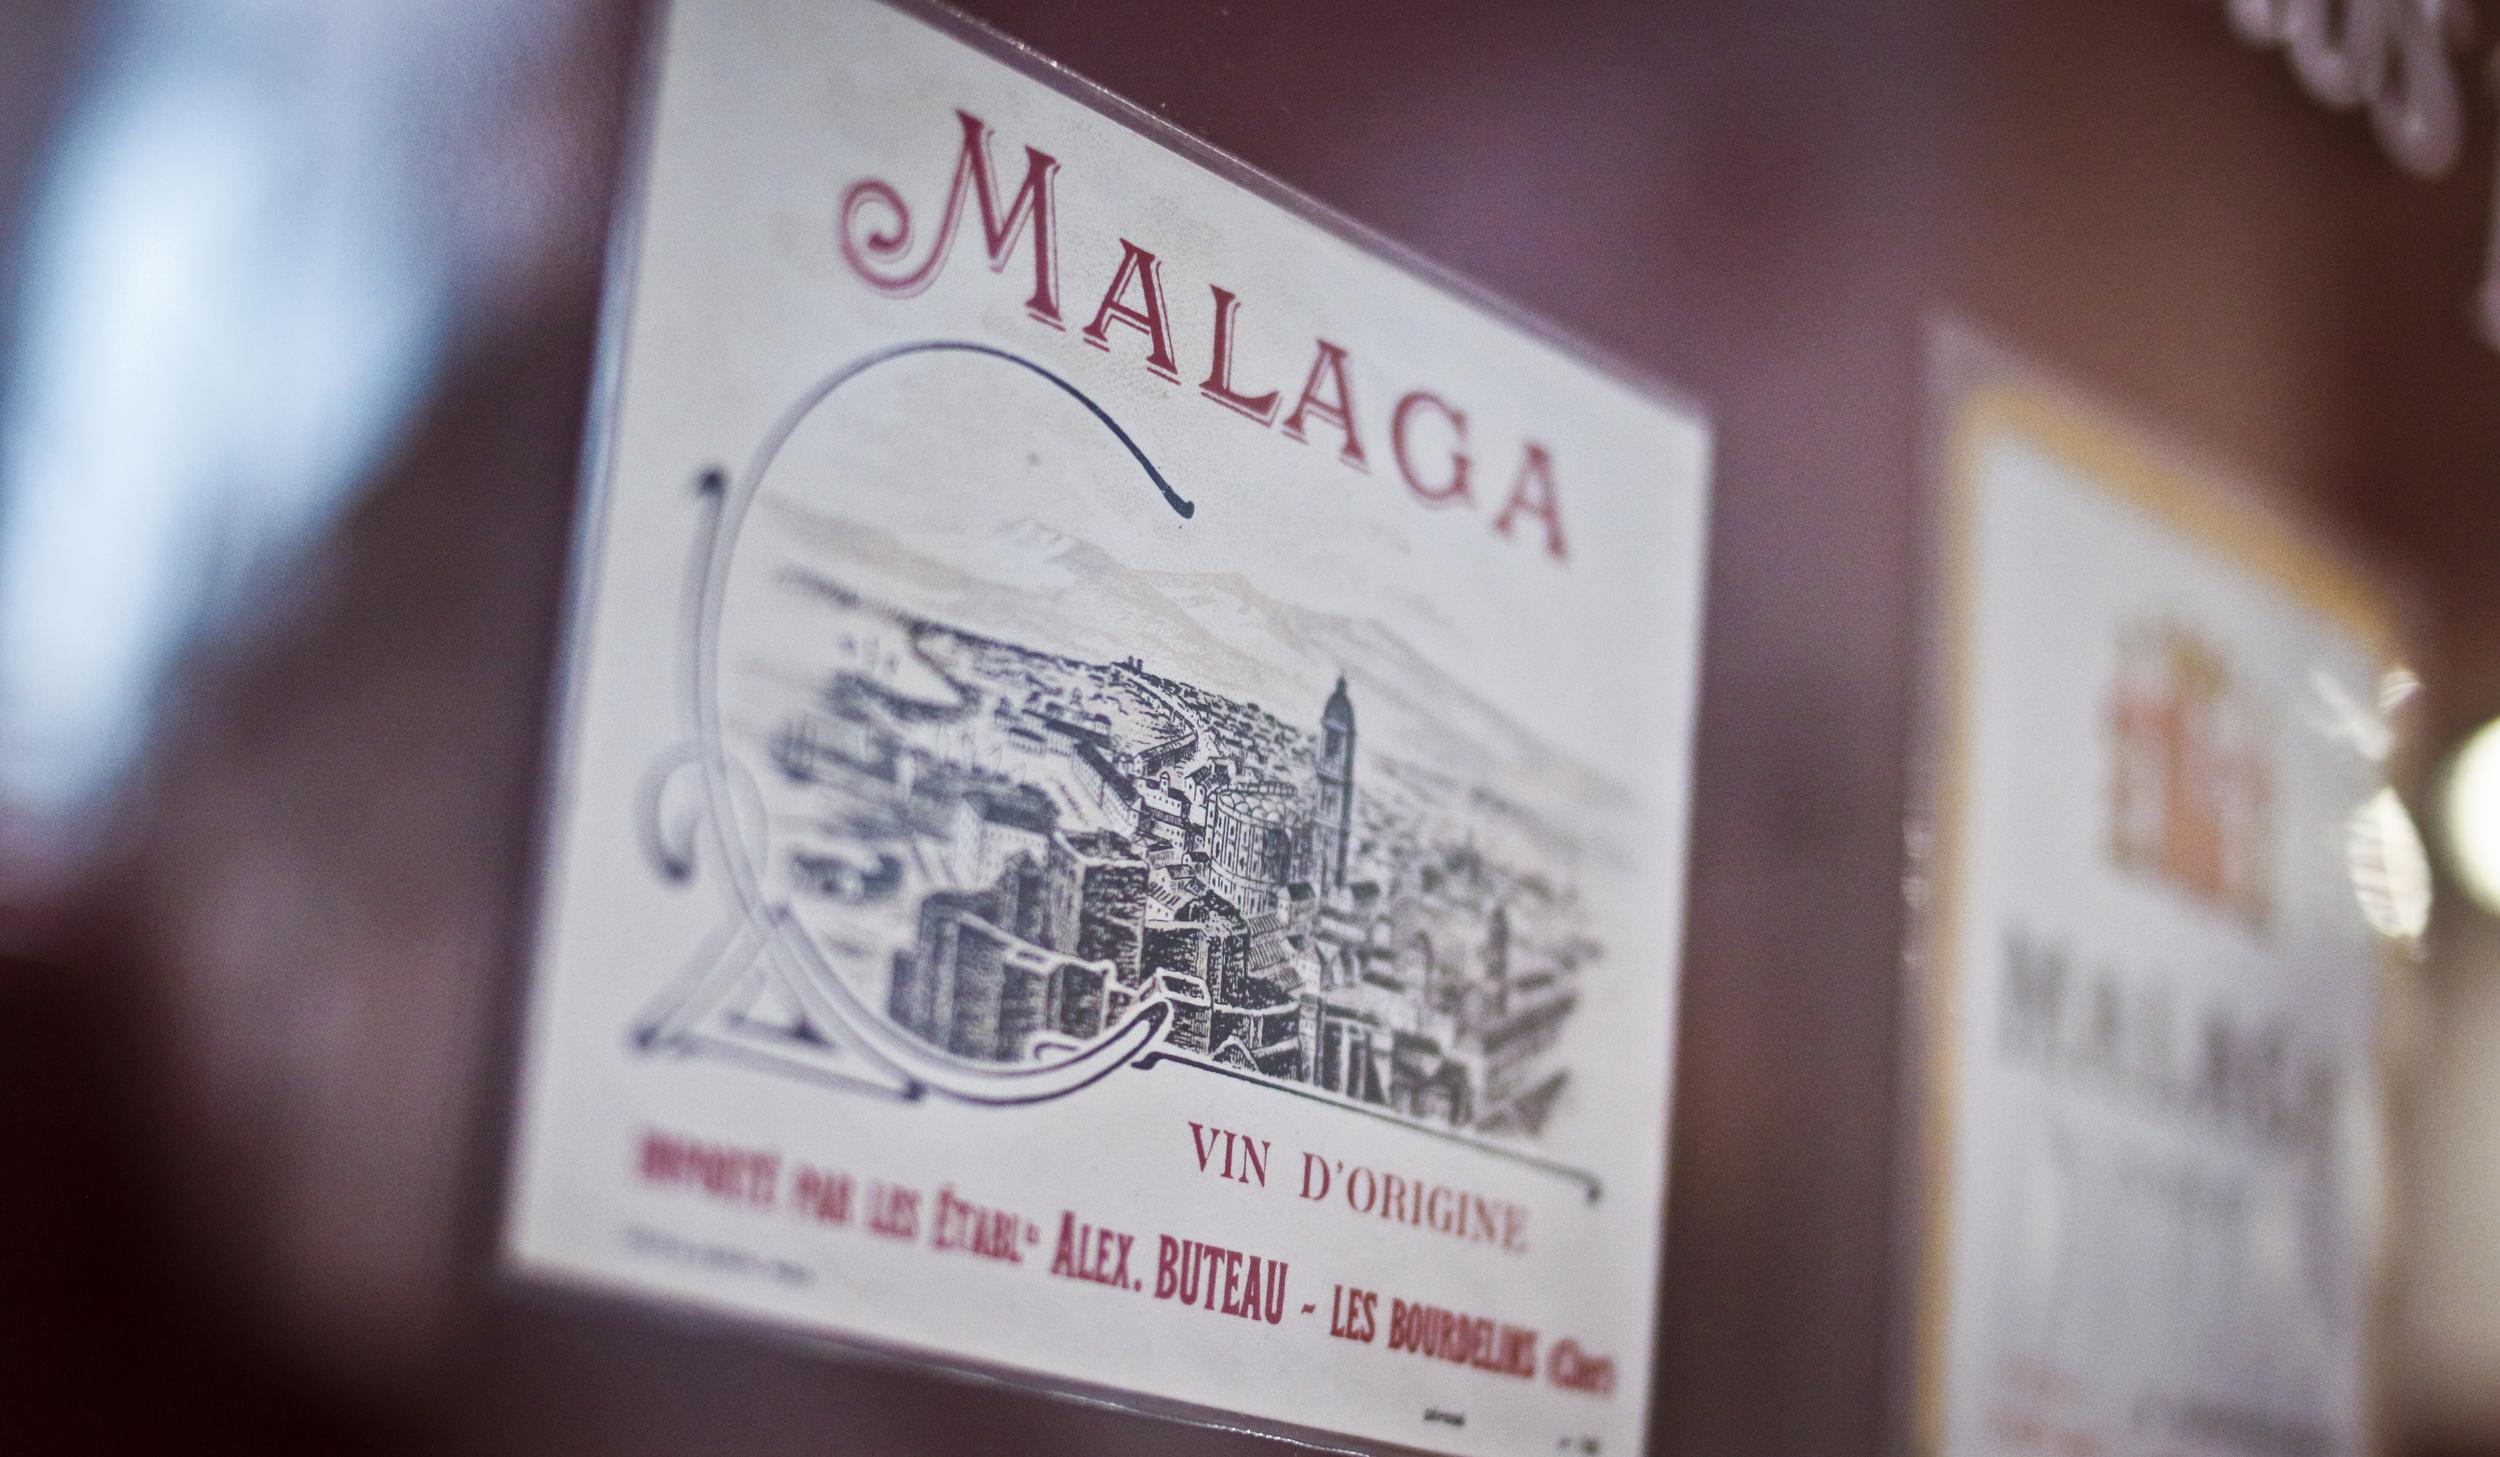 WineMuseum3labels.jpg